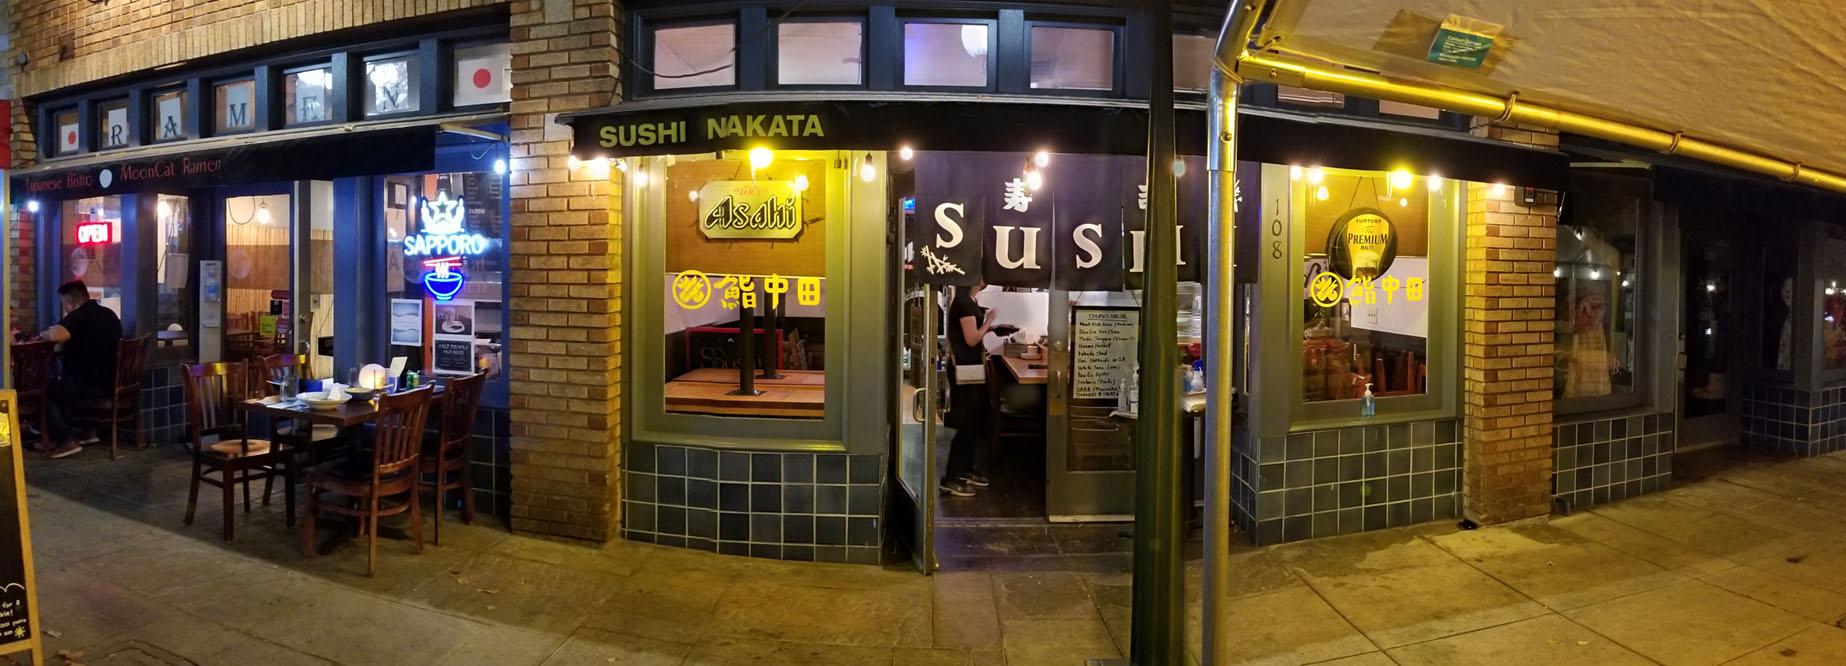 Sushi Nakata Exterior